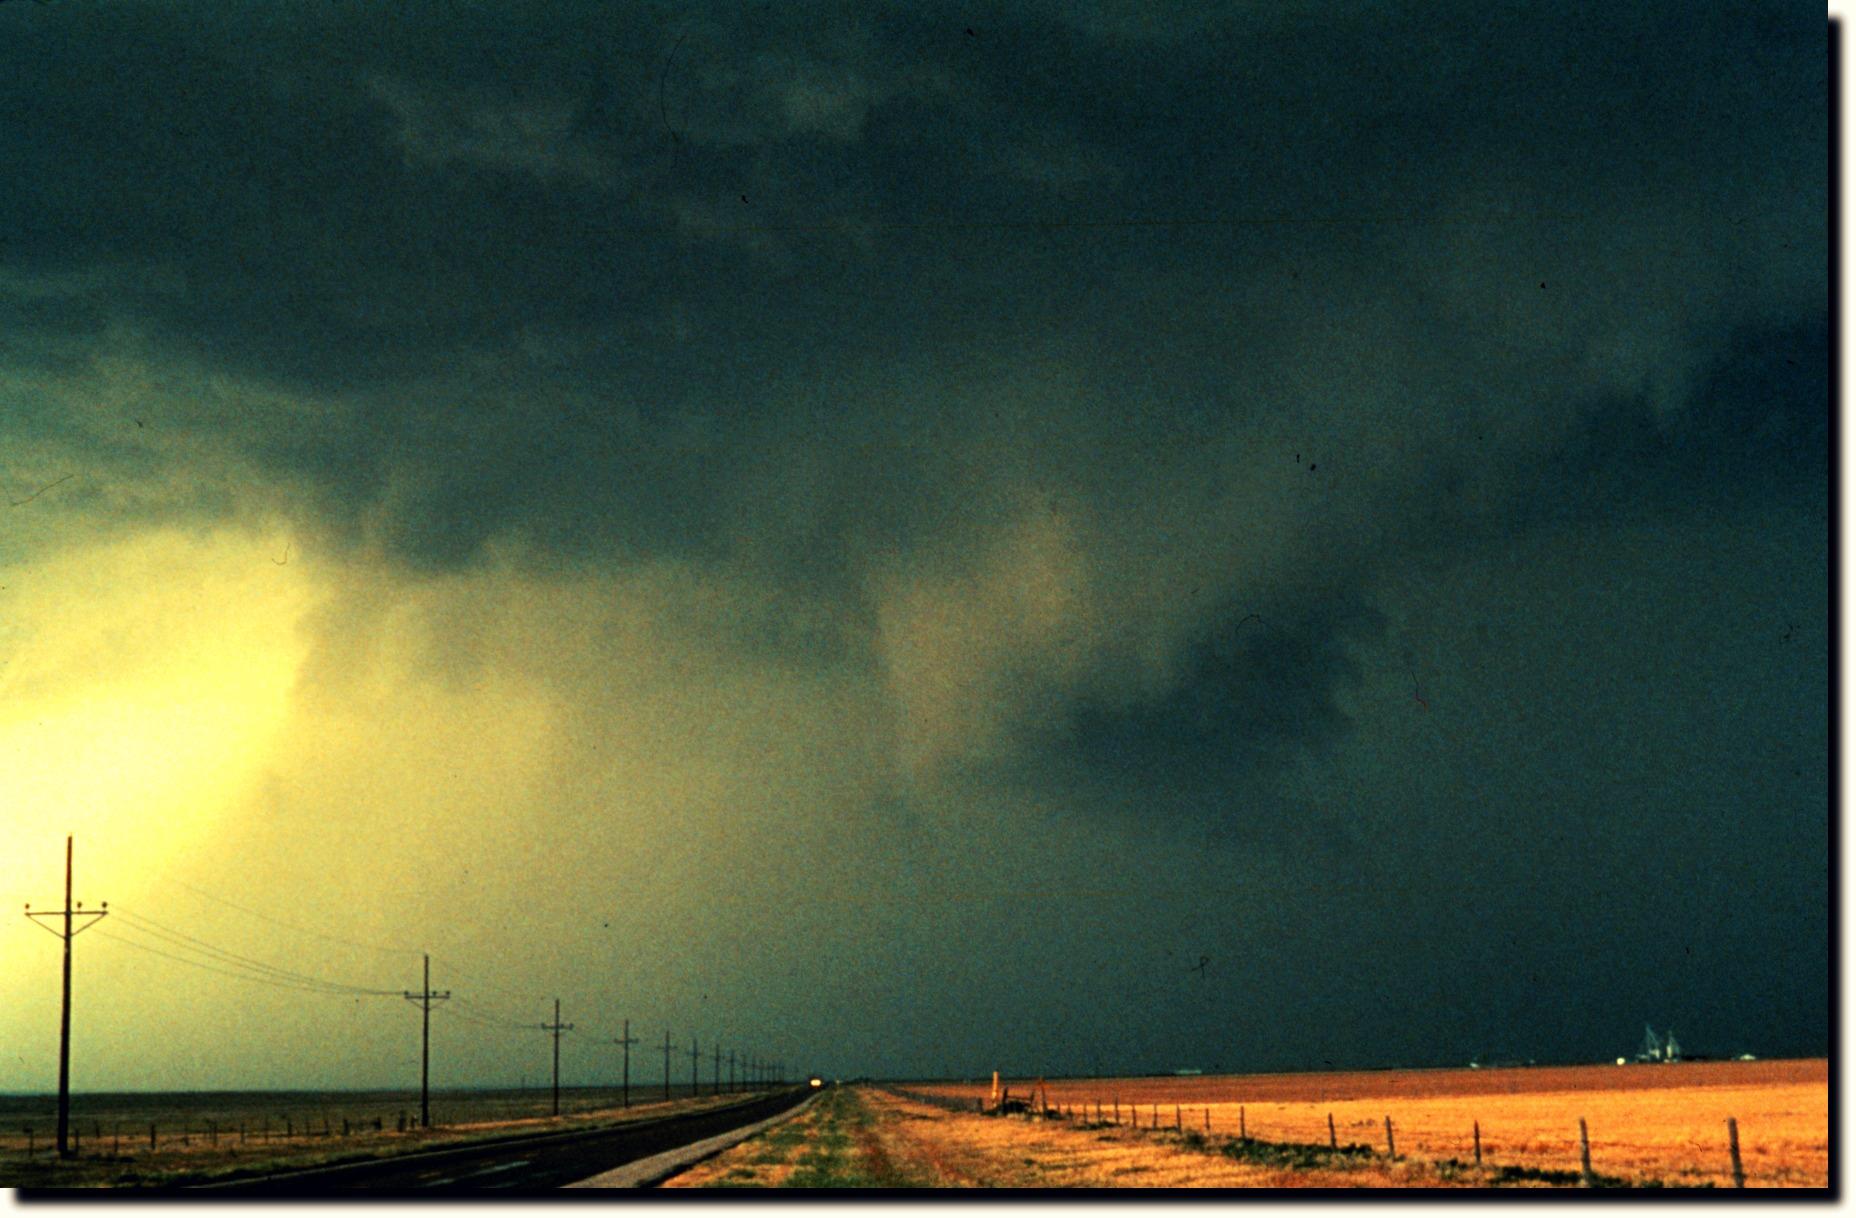 Thunderstorm_-_NOAA